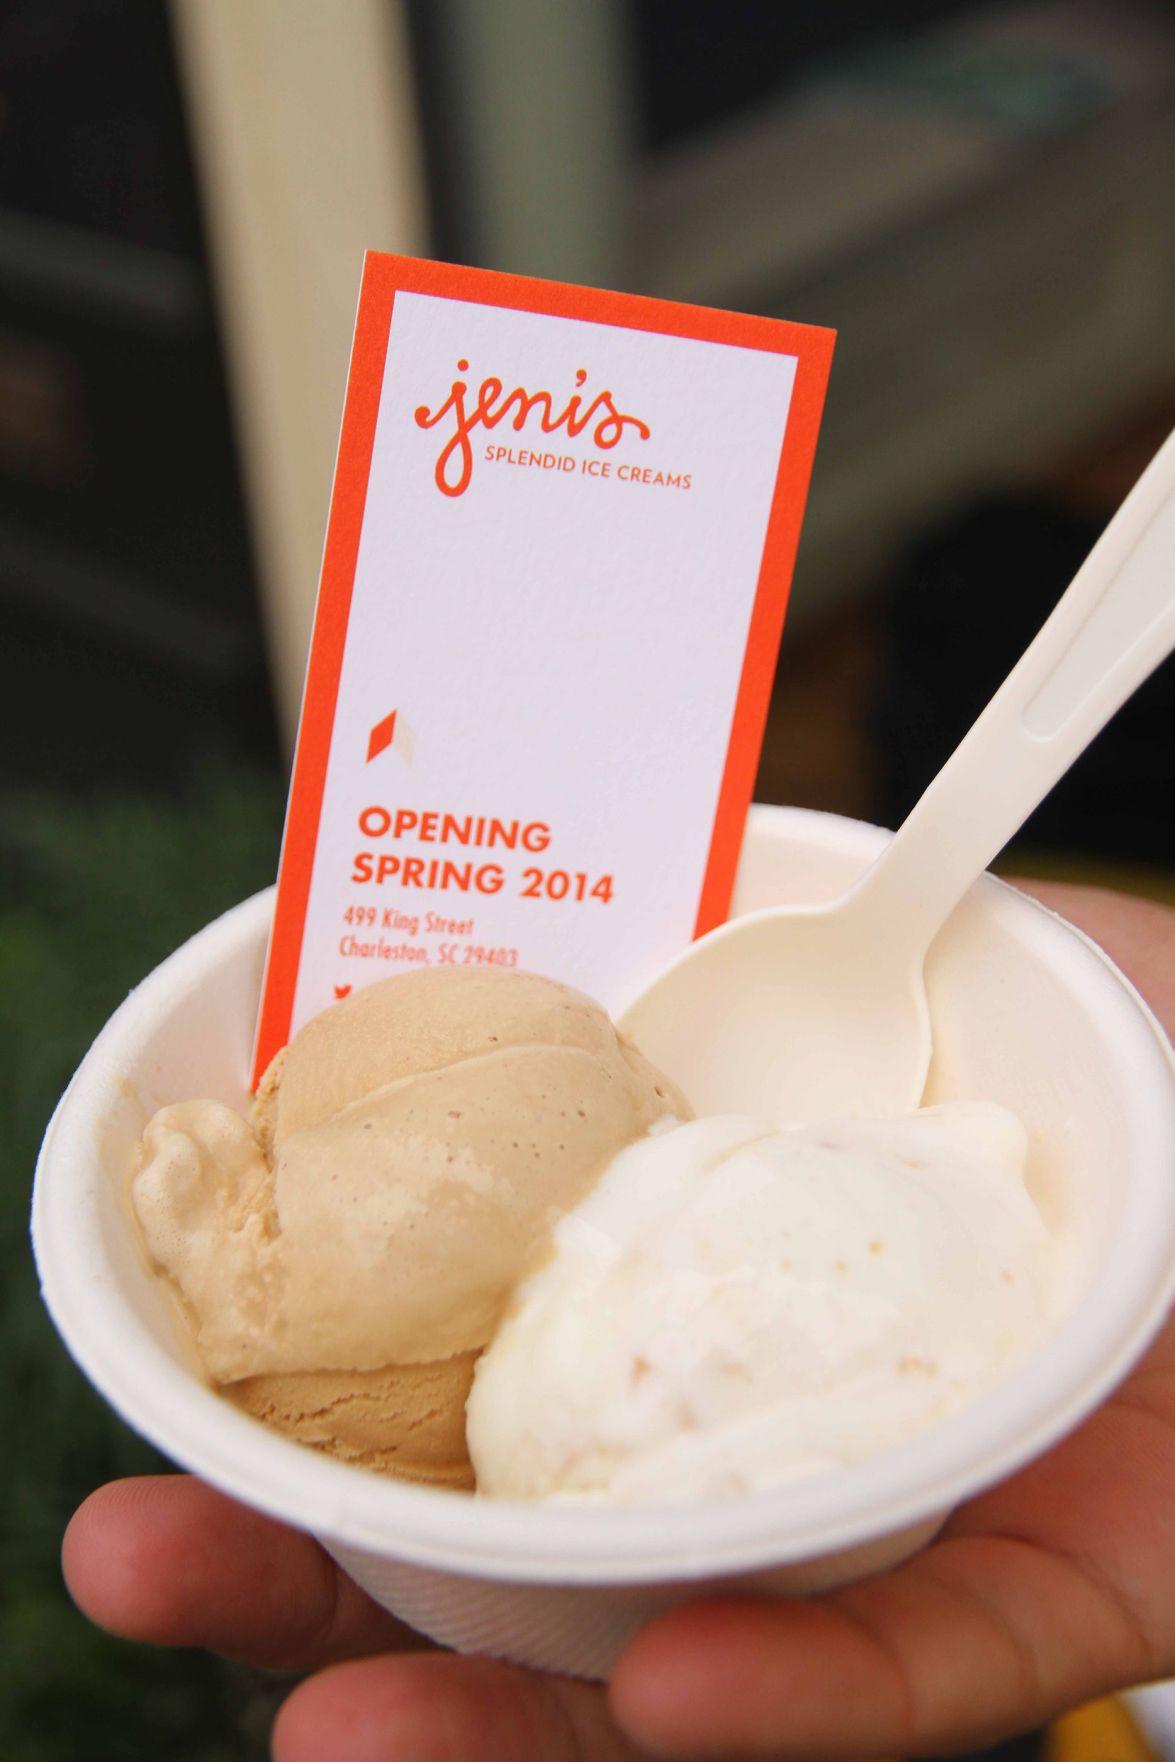 Jeni's Splendid Ice Creams to open in two weeks on Charleston's Upper King St.